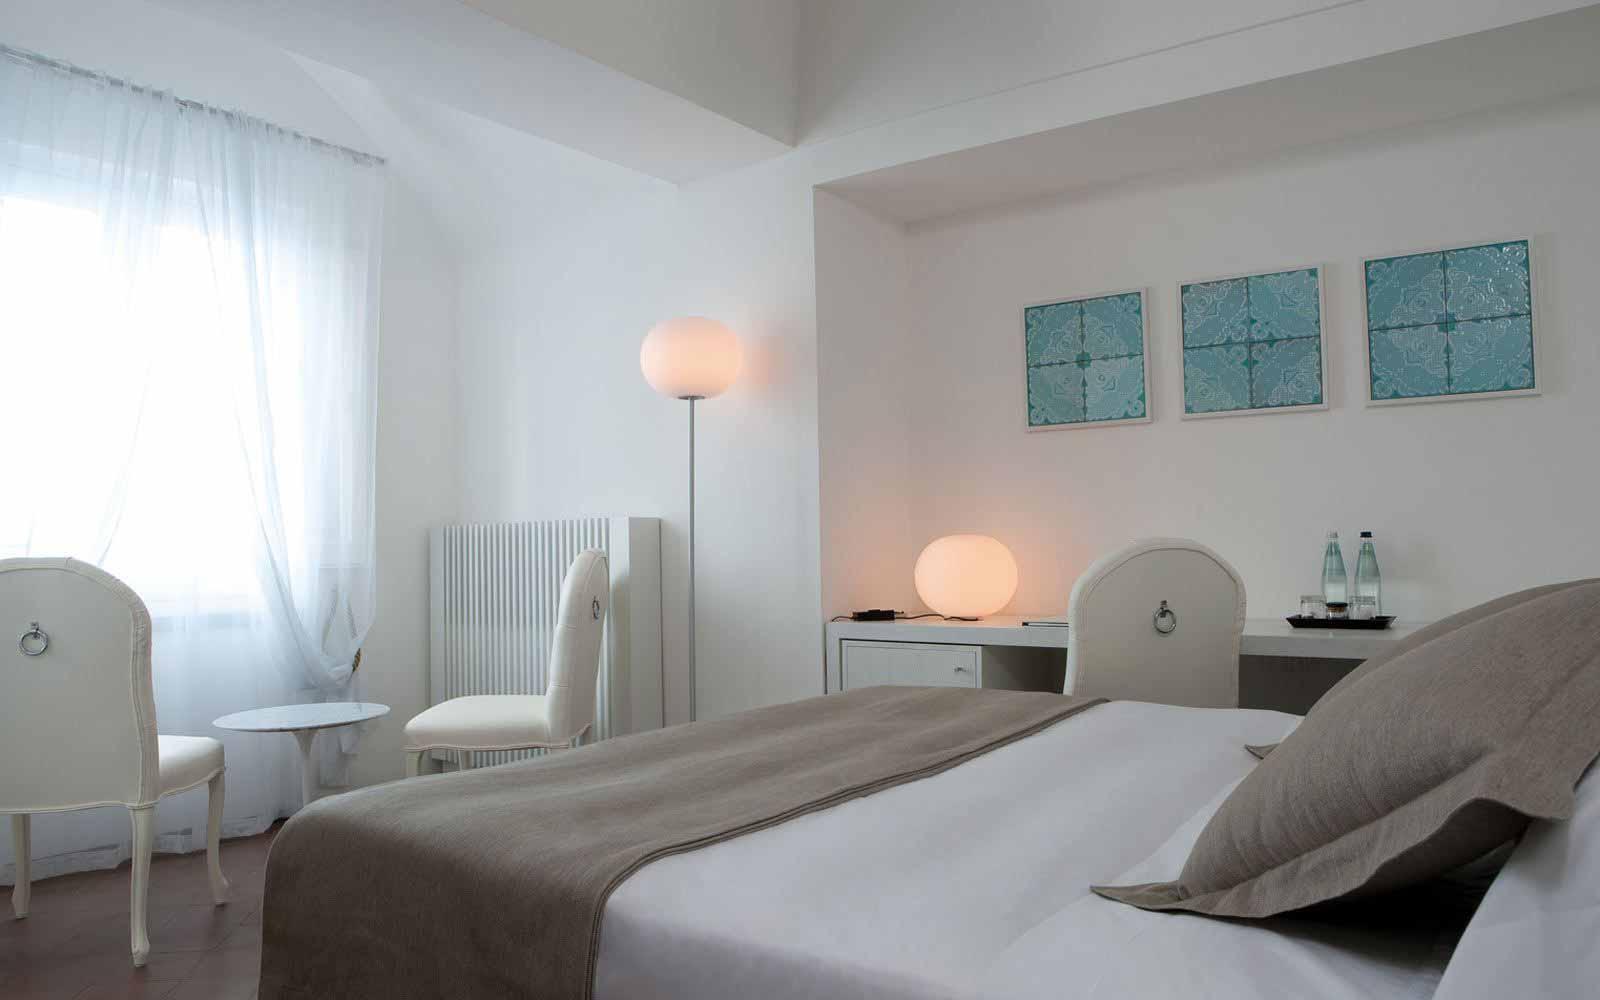 Standard Room at NH Collection Grand Hotel Convento di Amalfi